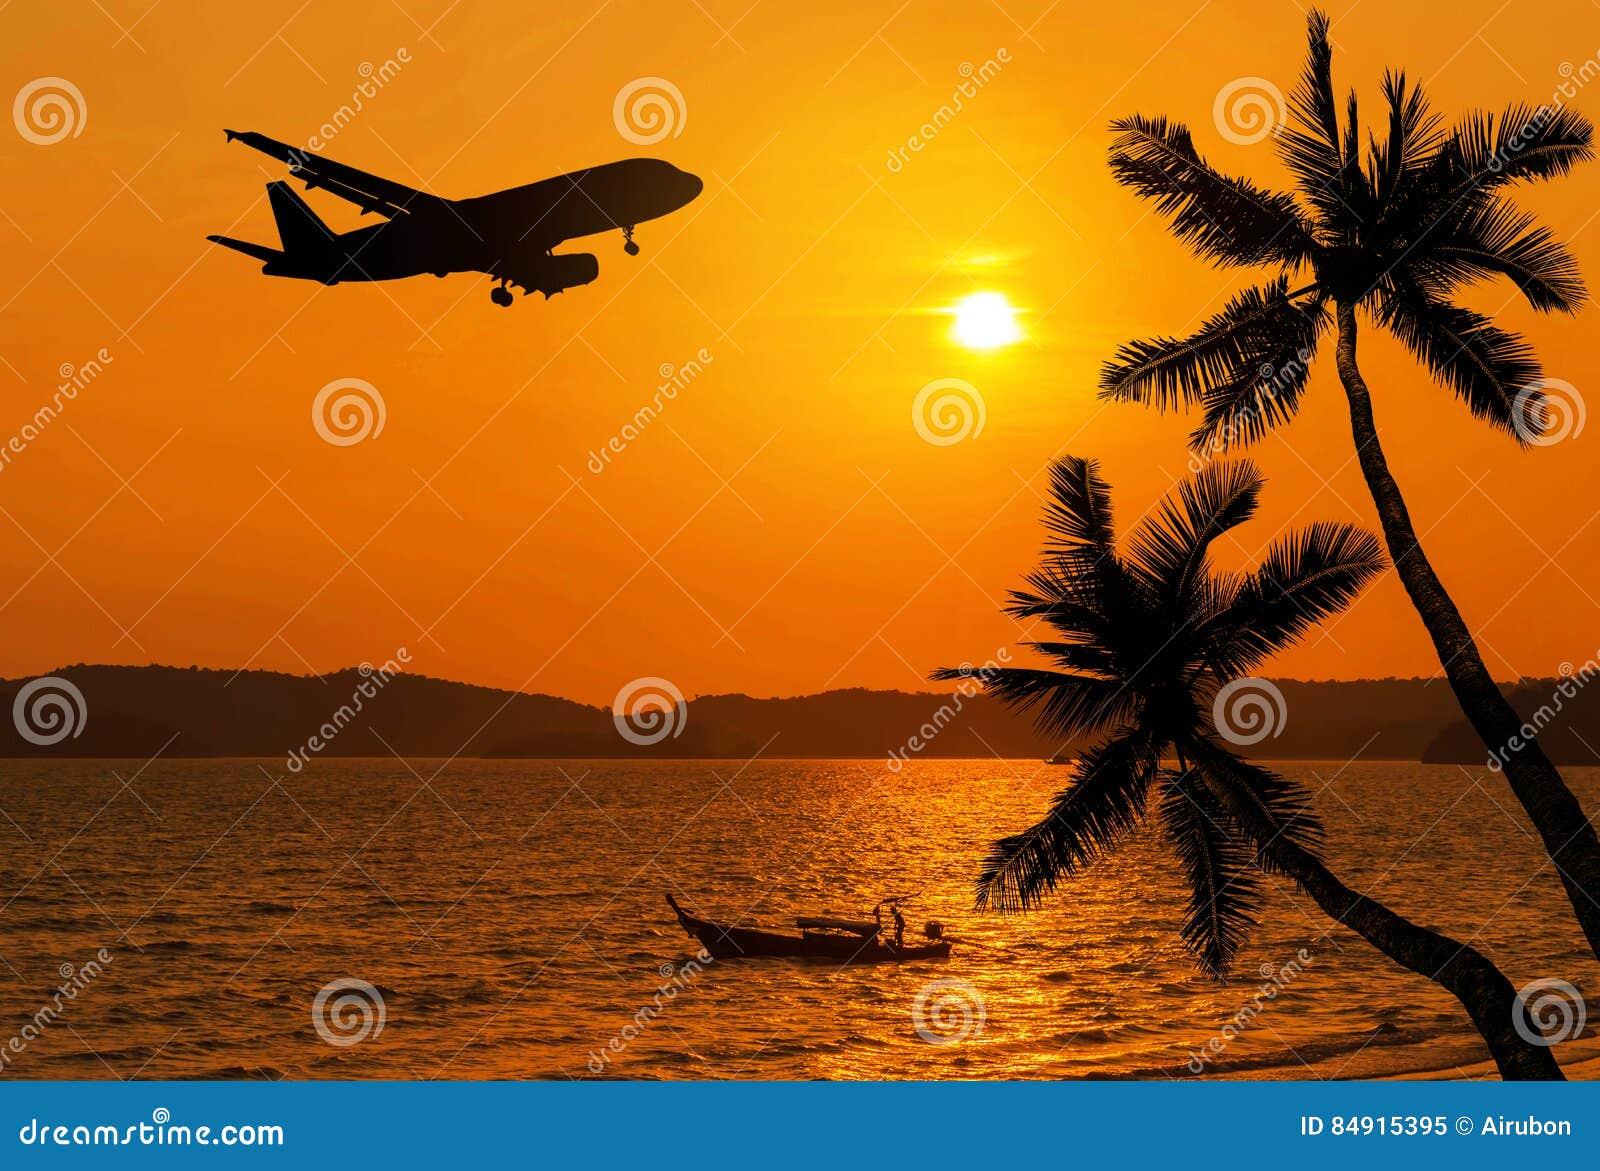 Airplane Flying Over The Beach Cartoon Vector ...